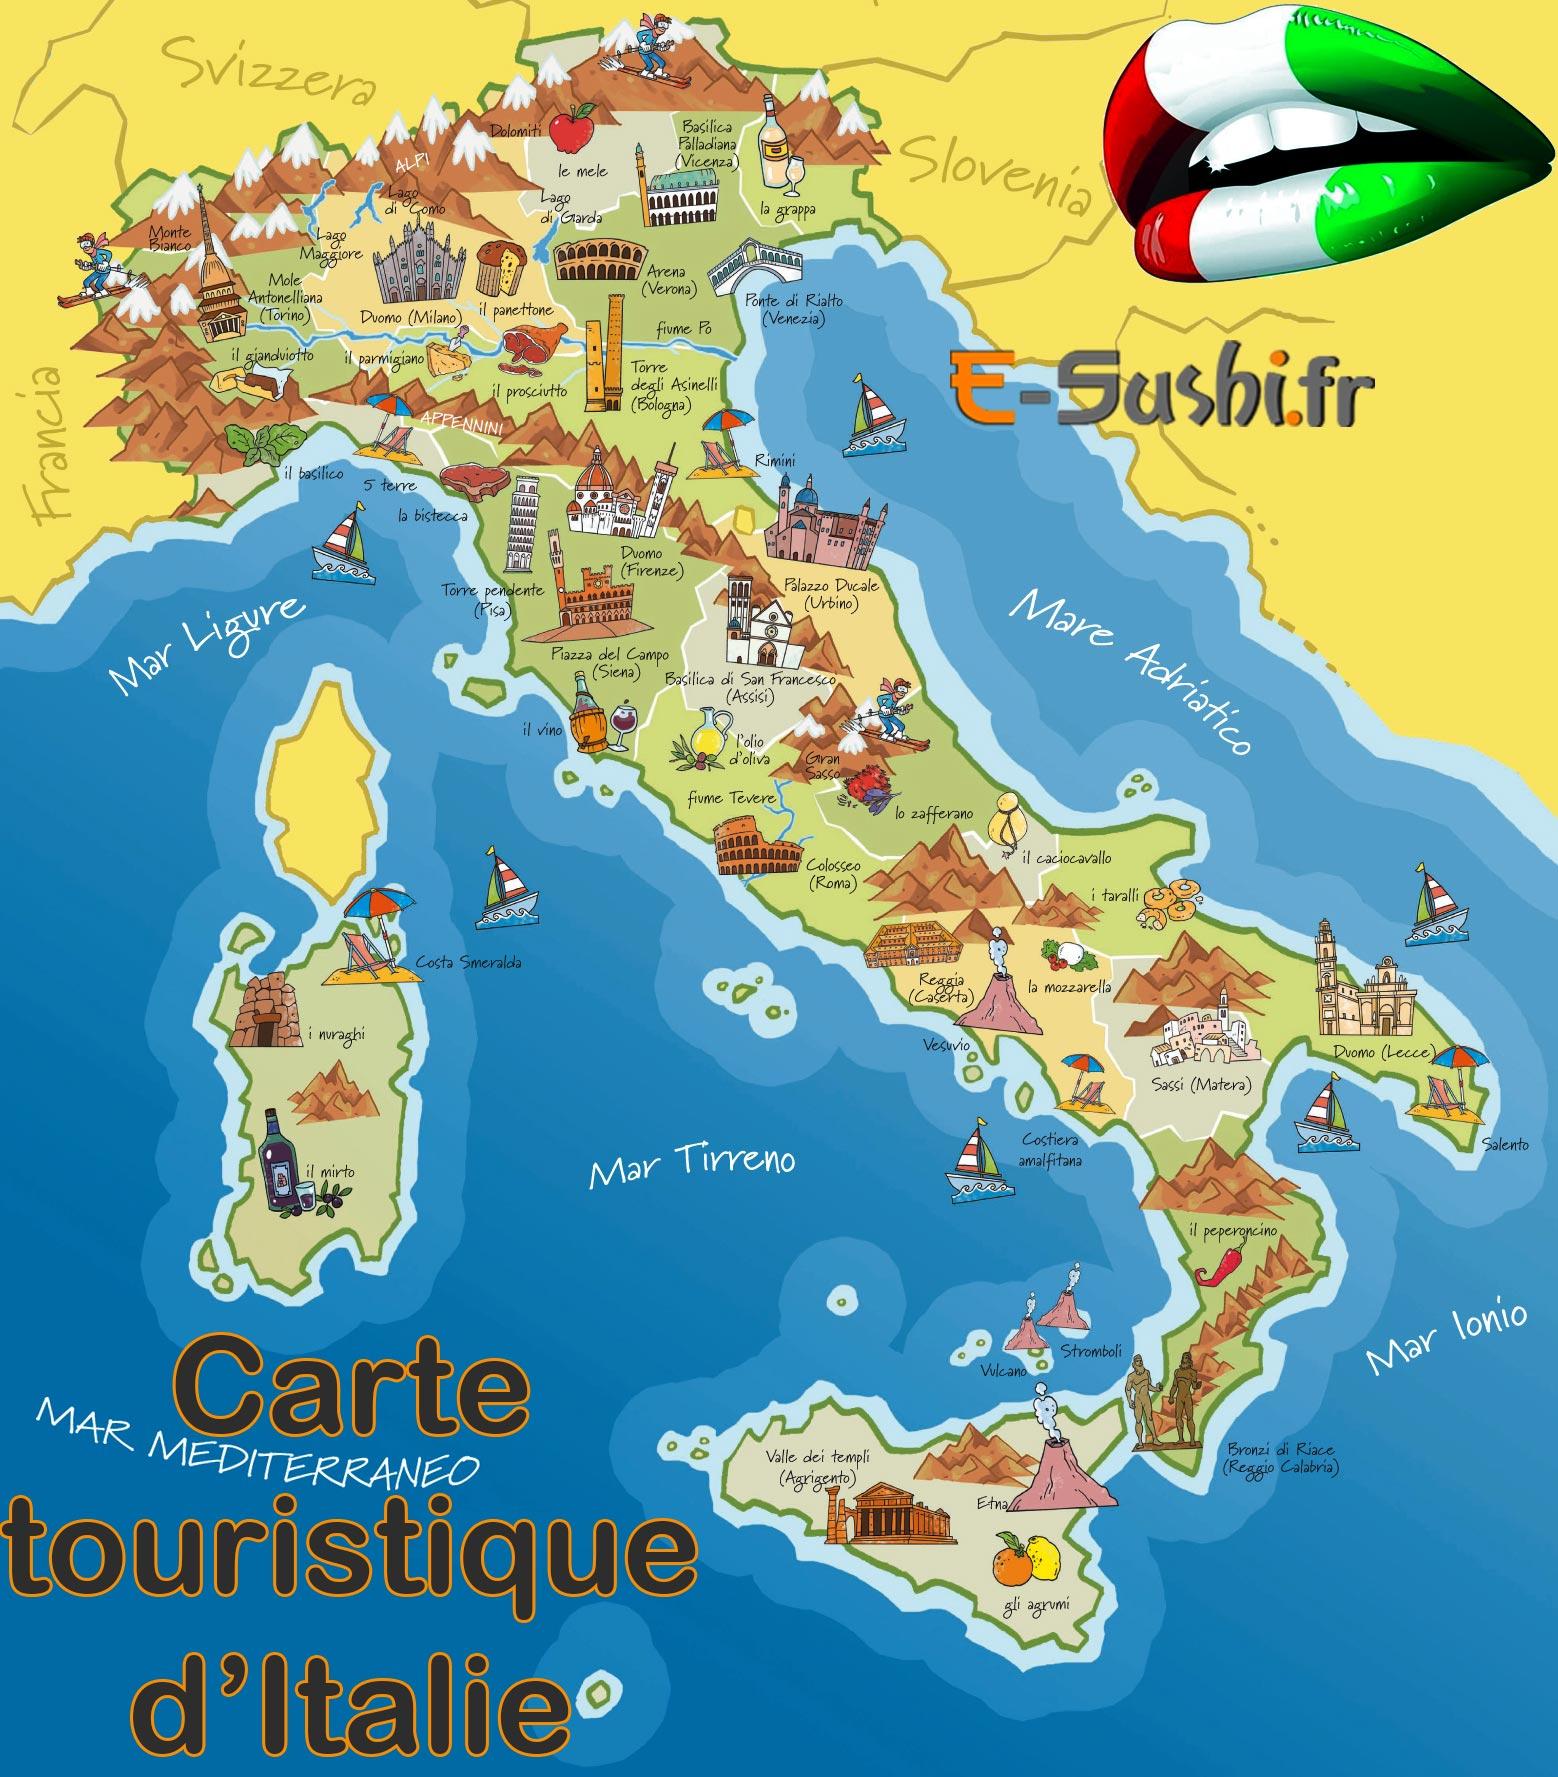 Sud italie tourisme